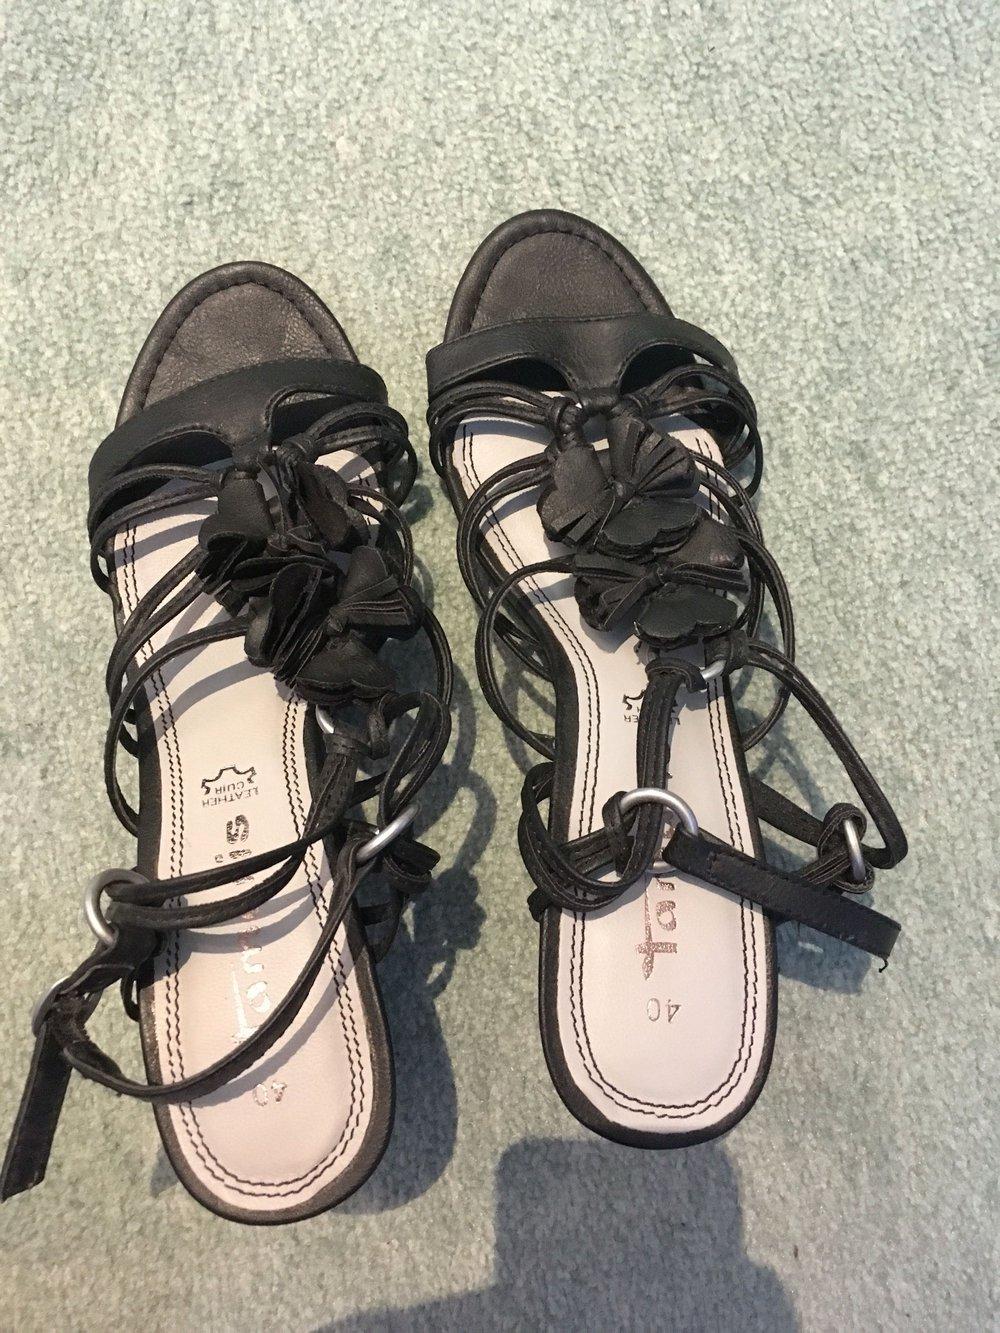 tamaris sandalen gr 40 nie getragen. Black Bedroom Furniture Sets. Home Design Ideas